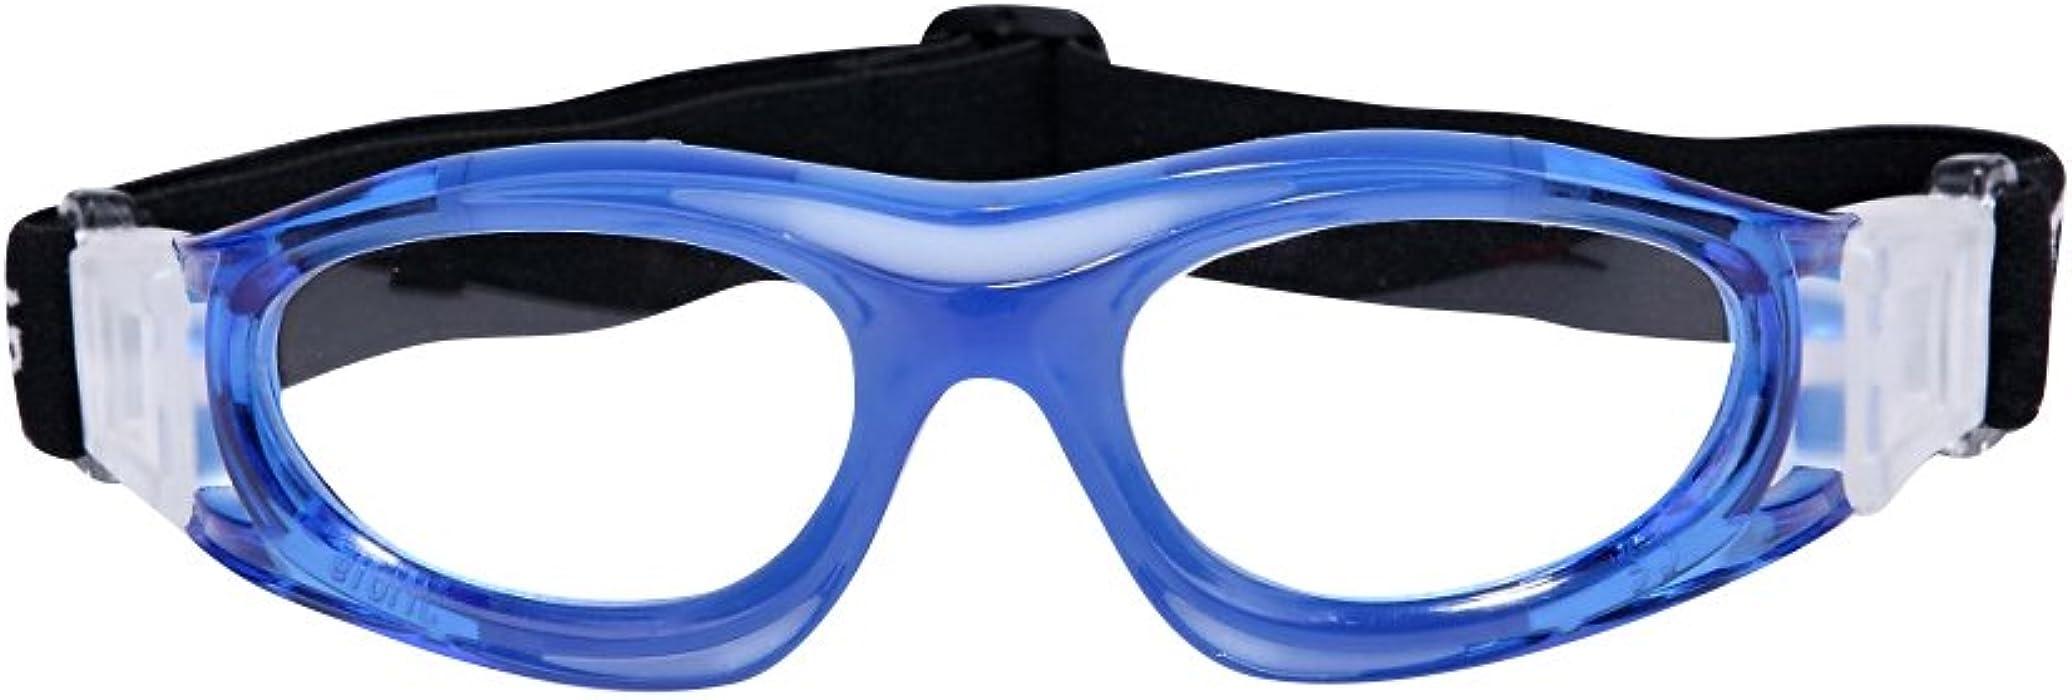 b779112b84e2 De Ding Basketball Football Prescription Goggle Soccer Safety Eyewear (blue)